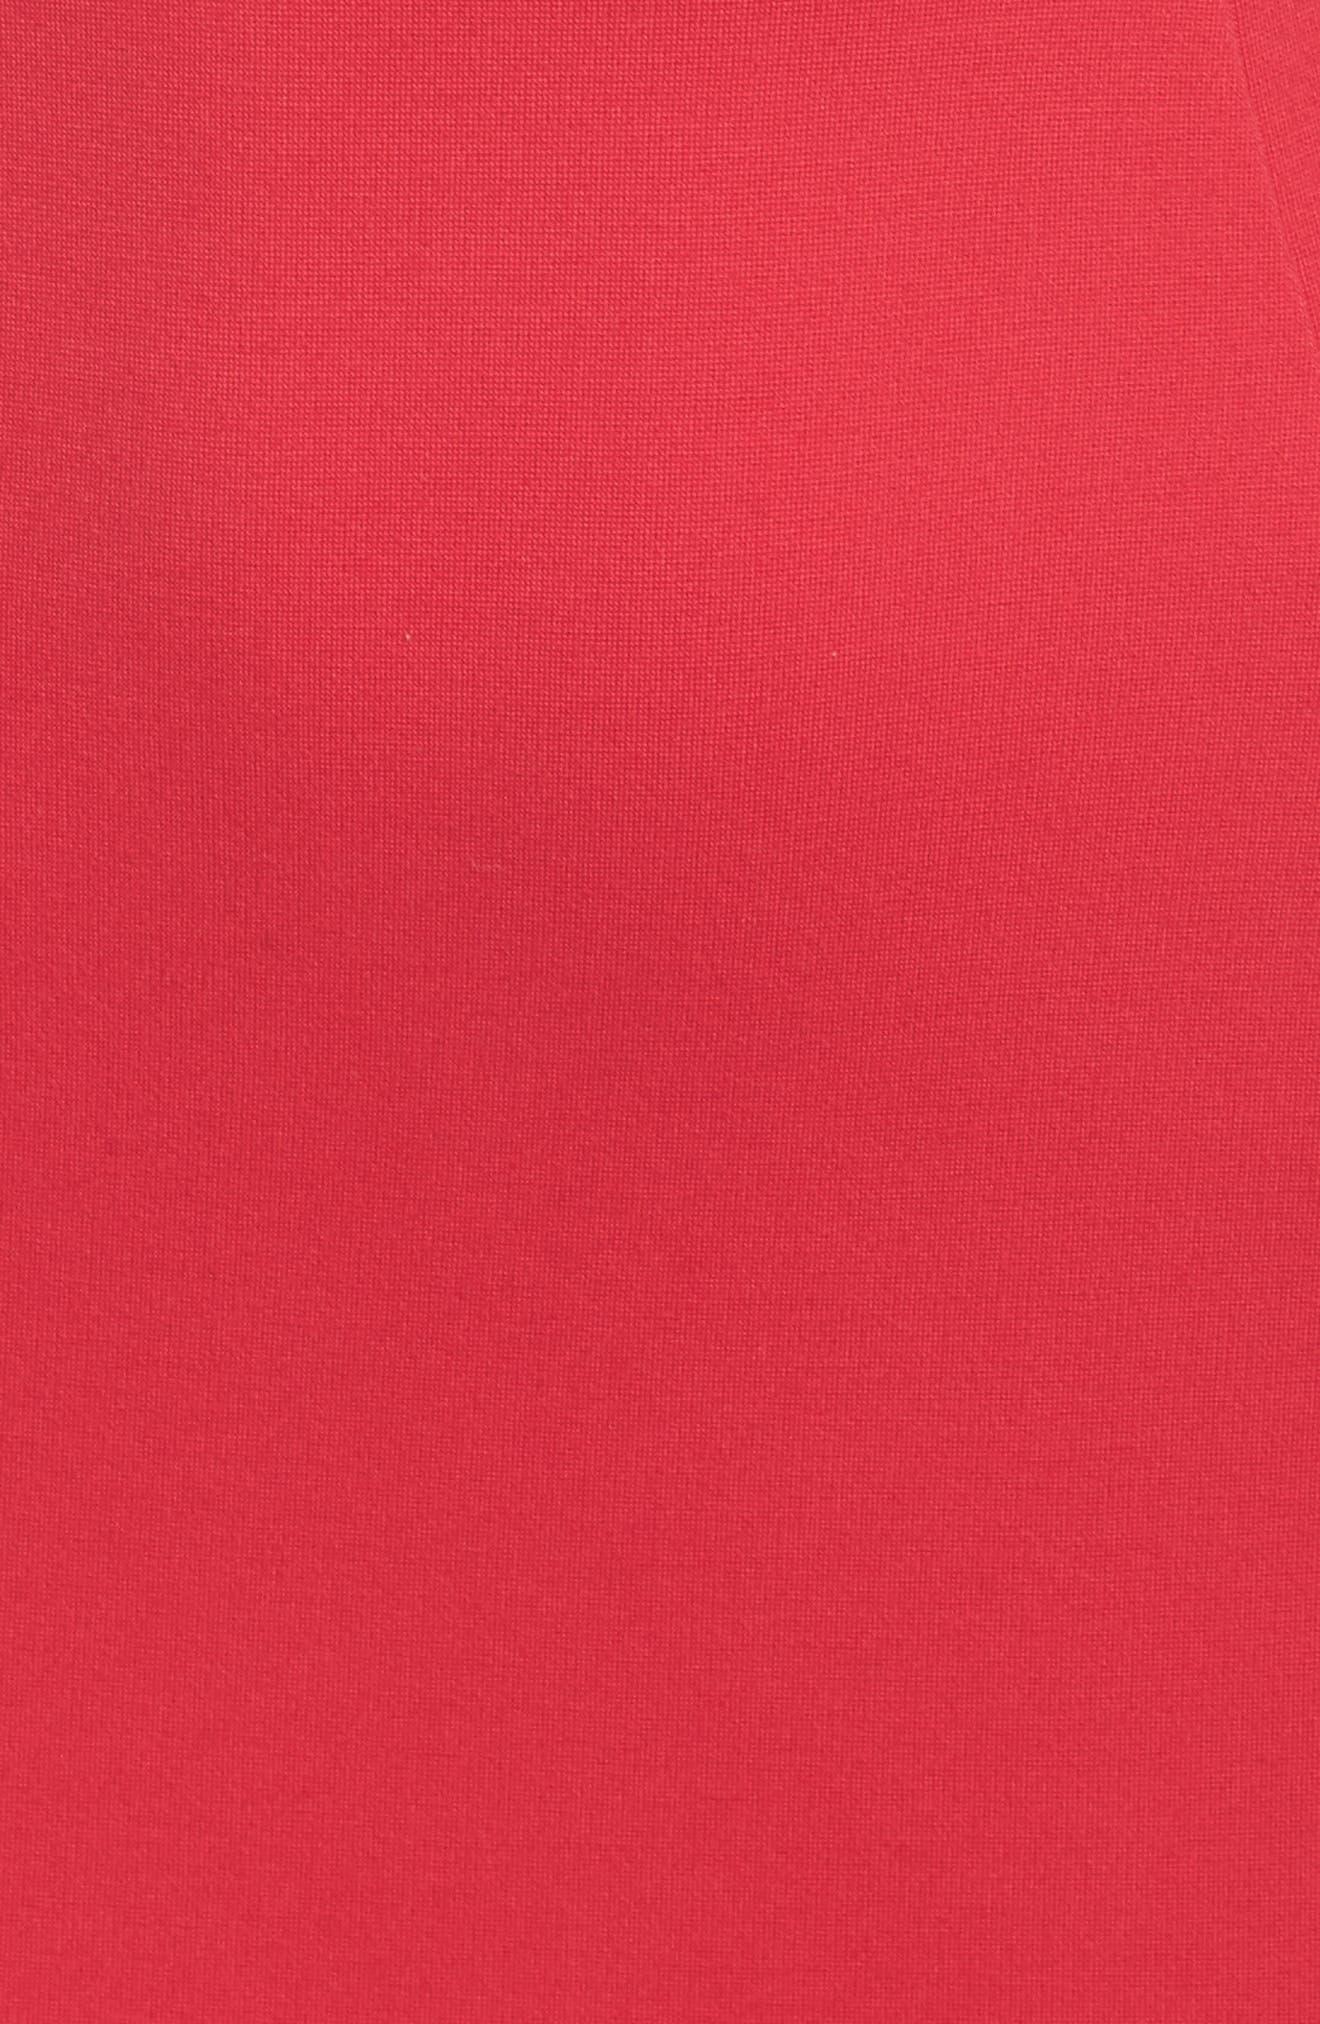 Lula Sheath Dress,                             Alternate thumbnail 6, color,                             WATERMELON